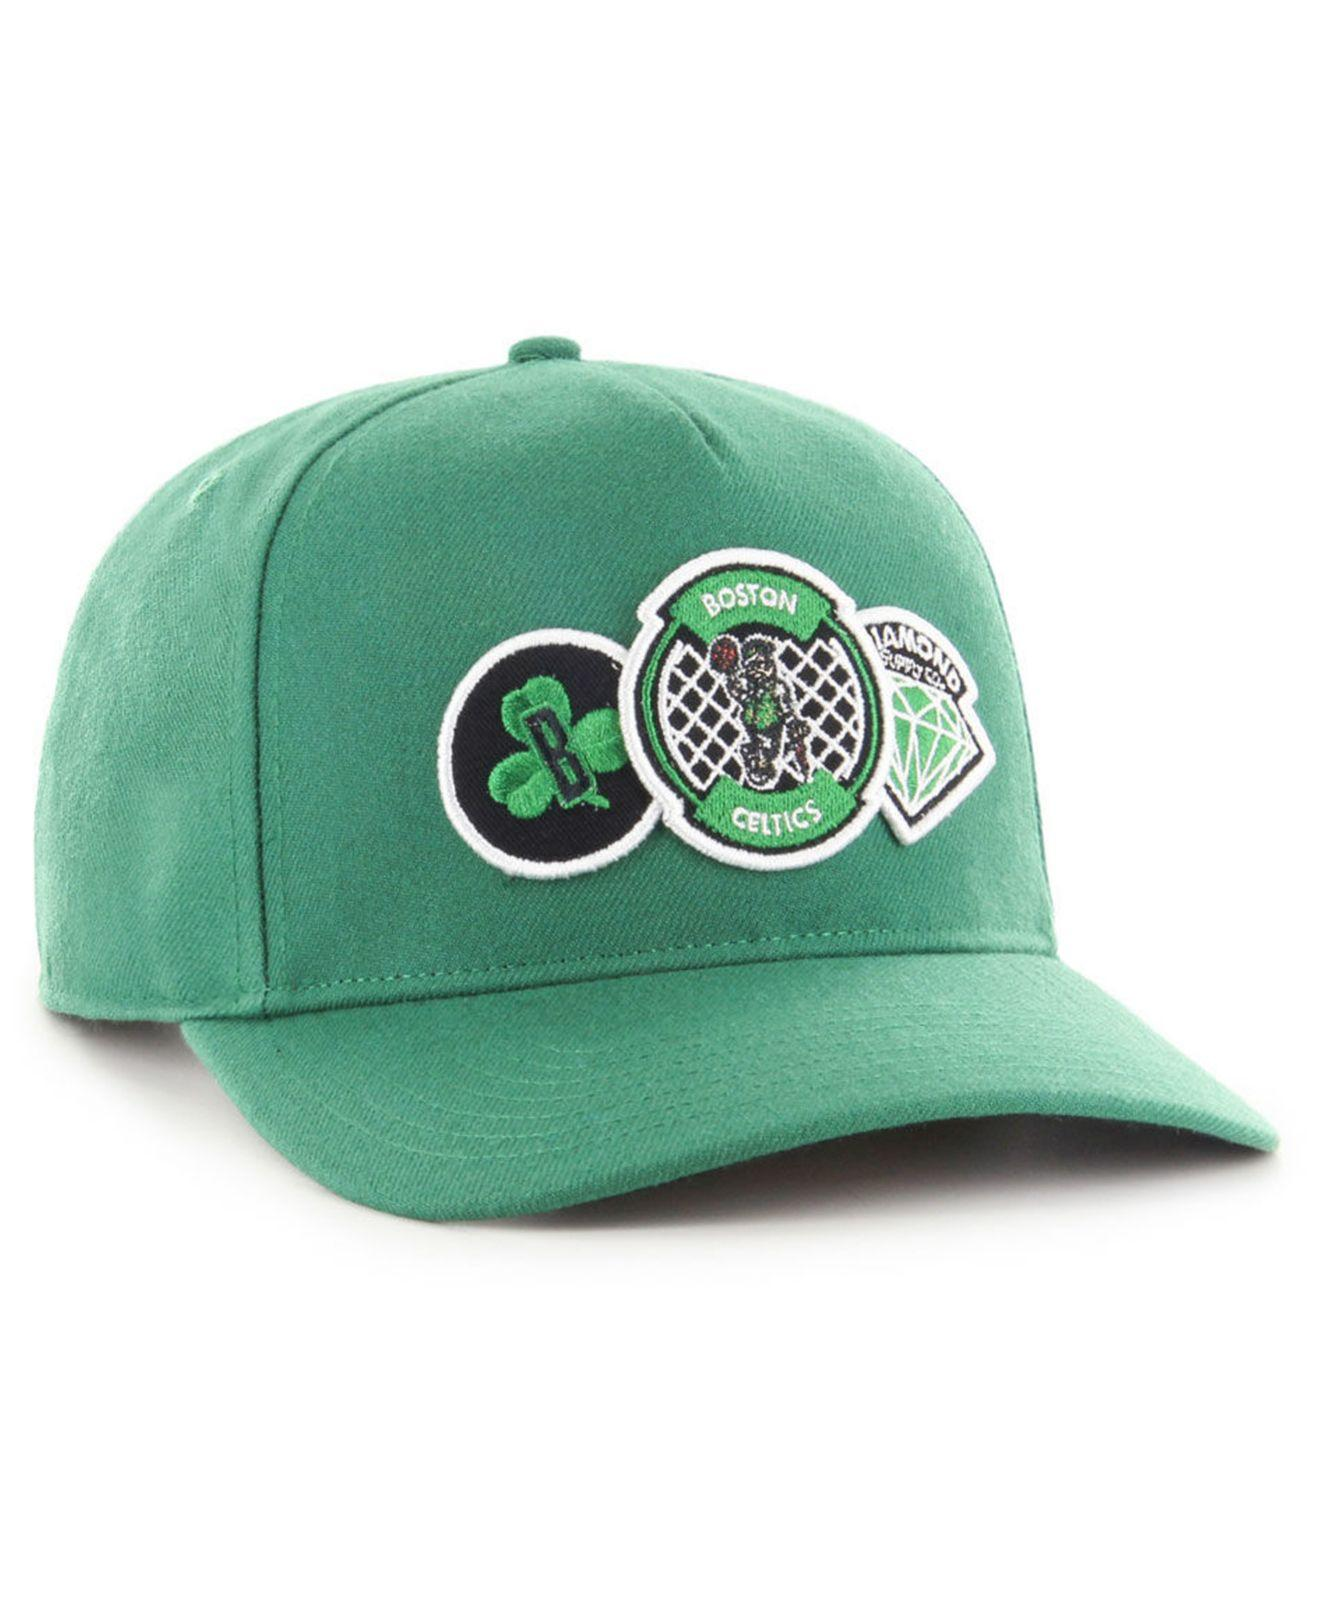 6525067caea079 Lyst - 47 Brand Boston Celtics Diamond Patch Captain Dt Cap in Green for Men